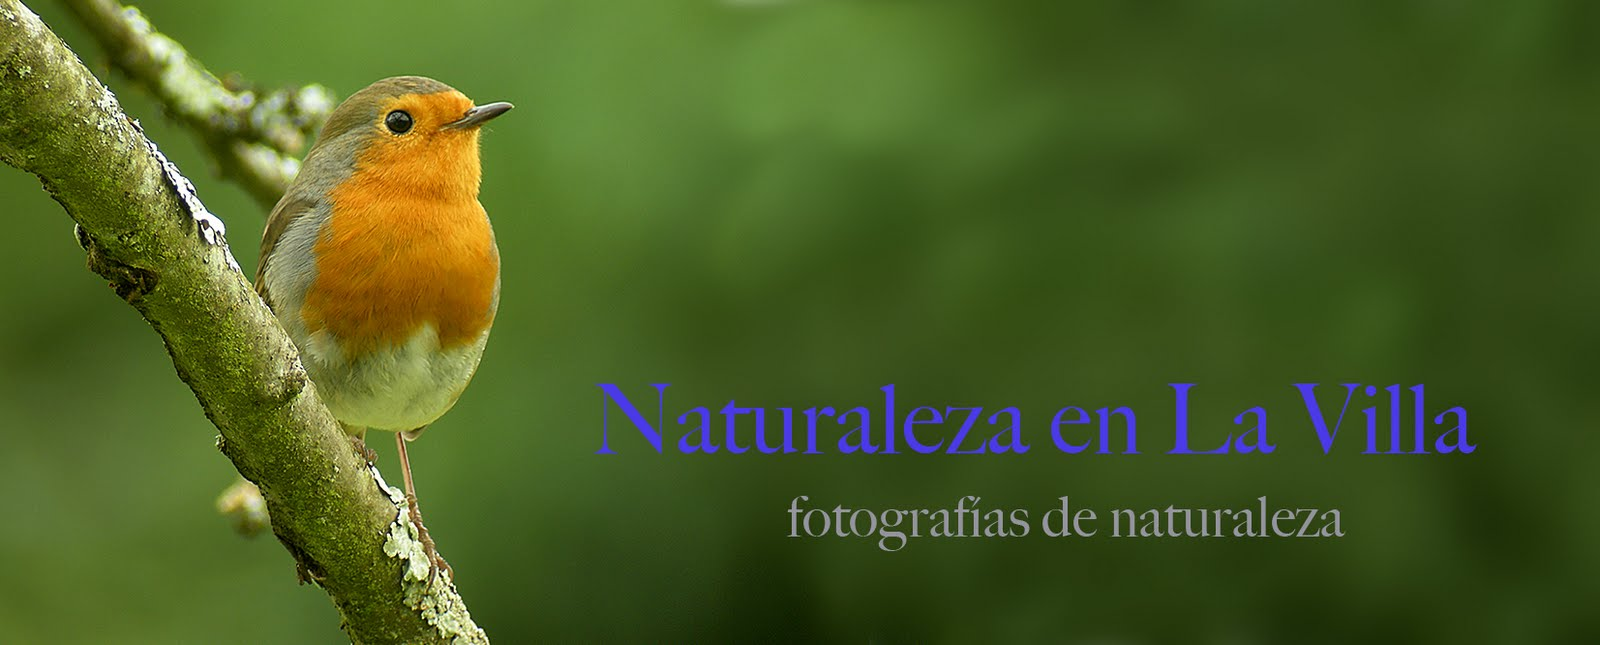 naturaleza en La Villa